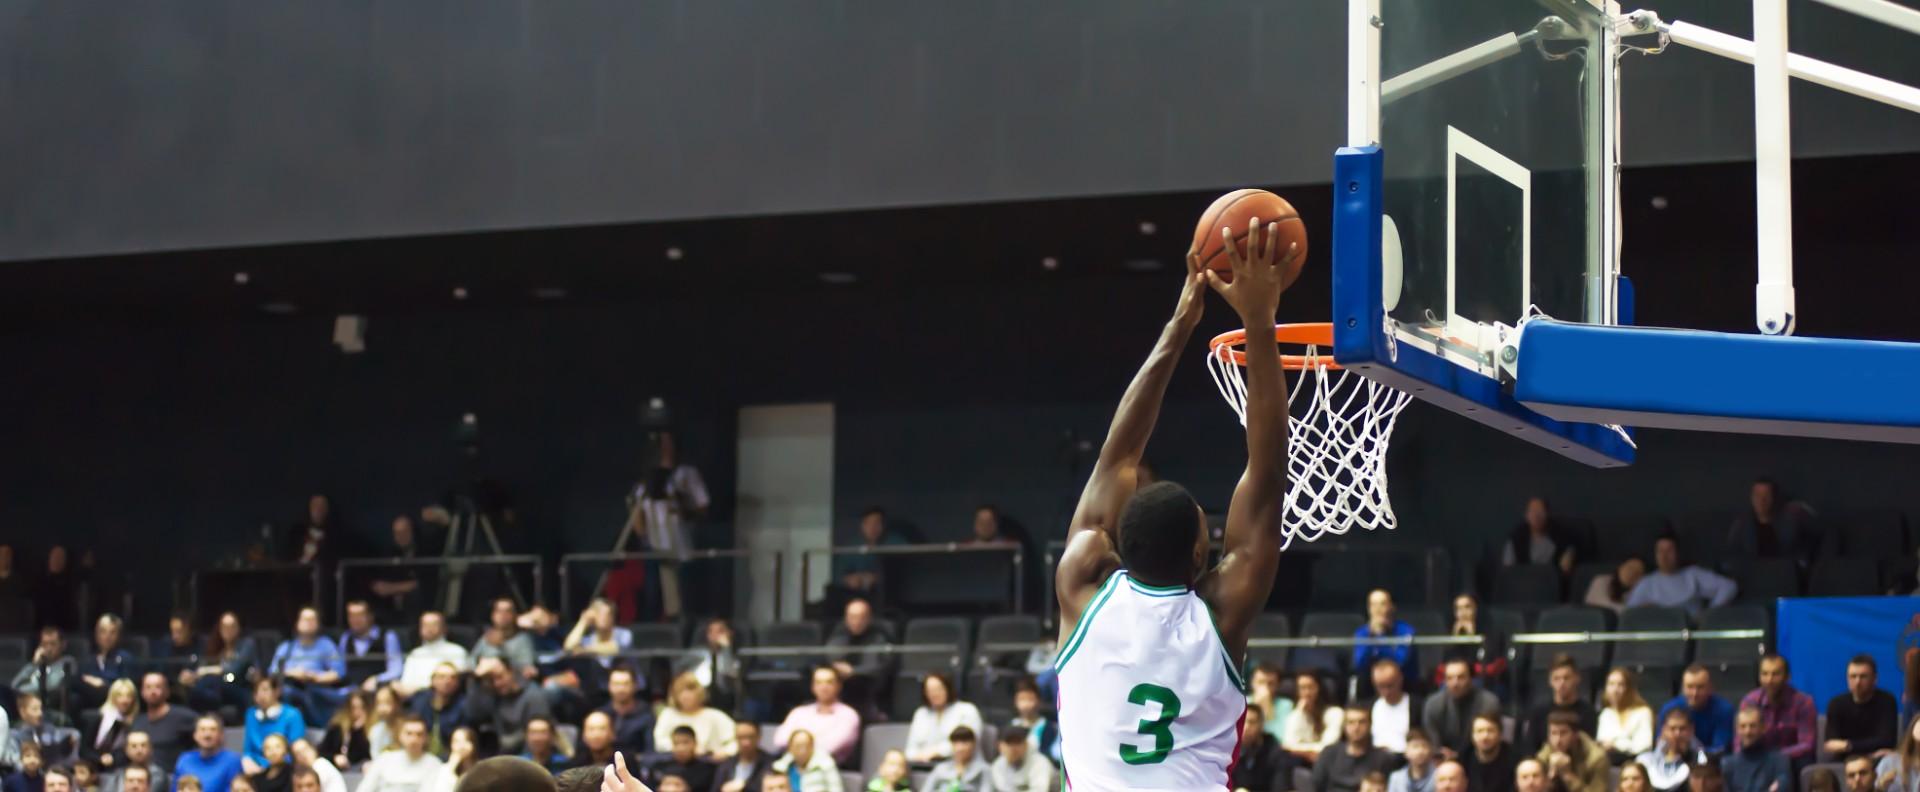 Predicting NBA Outcomes